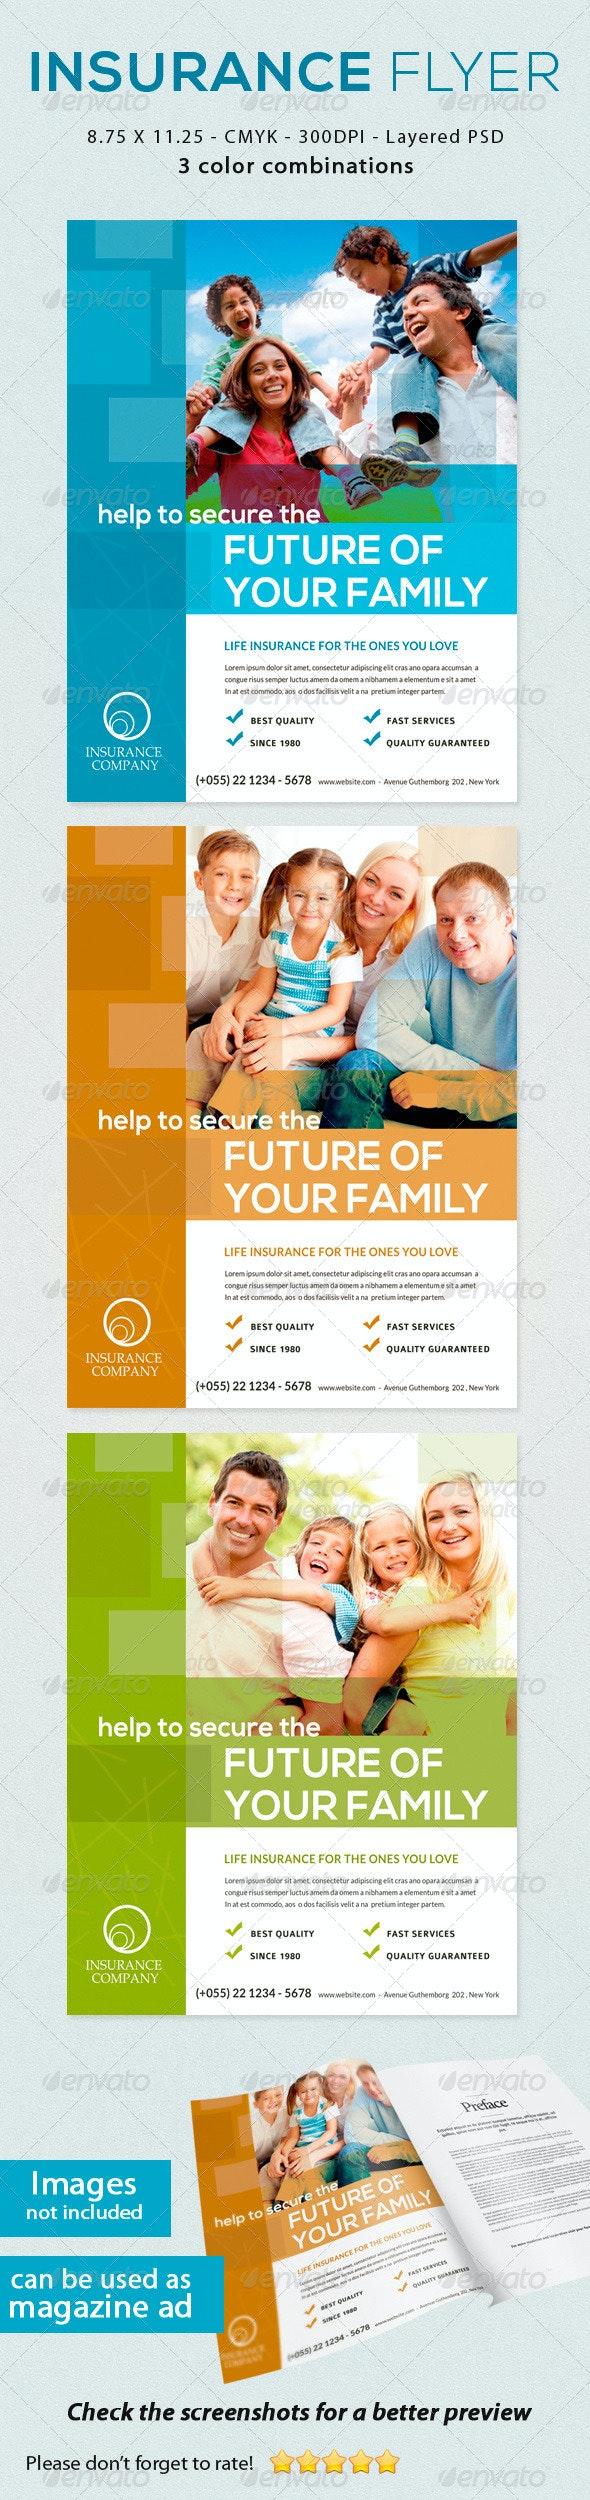 Insurance Flyer - Print Templates